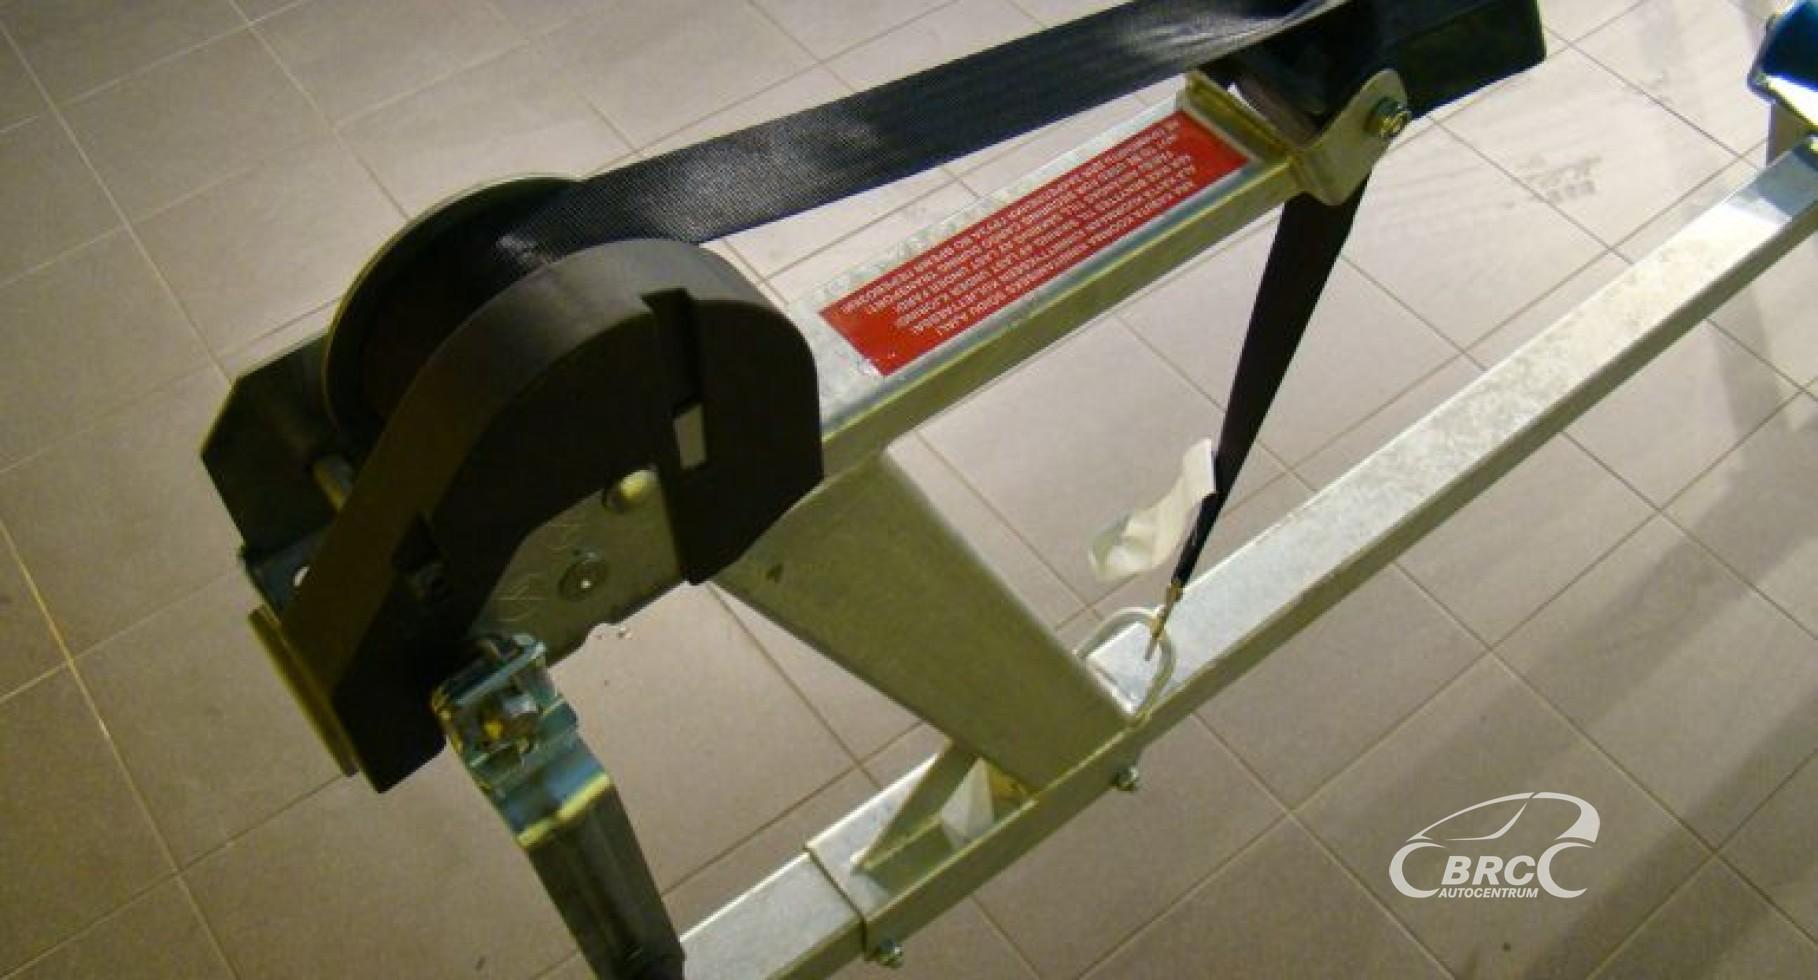 Tiki Treiler BT 600 BS600-L